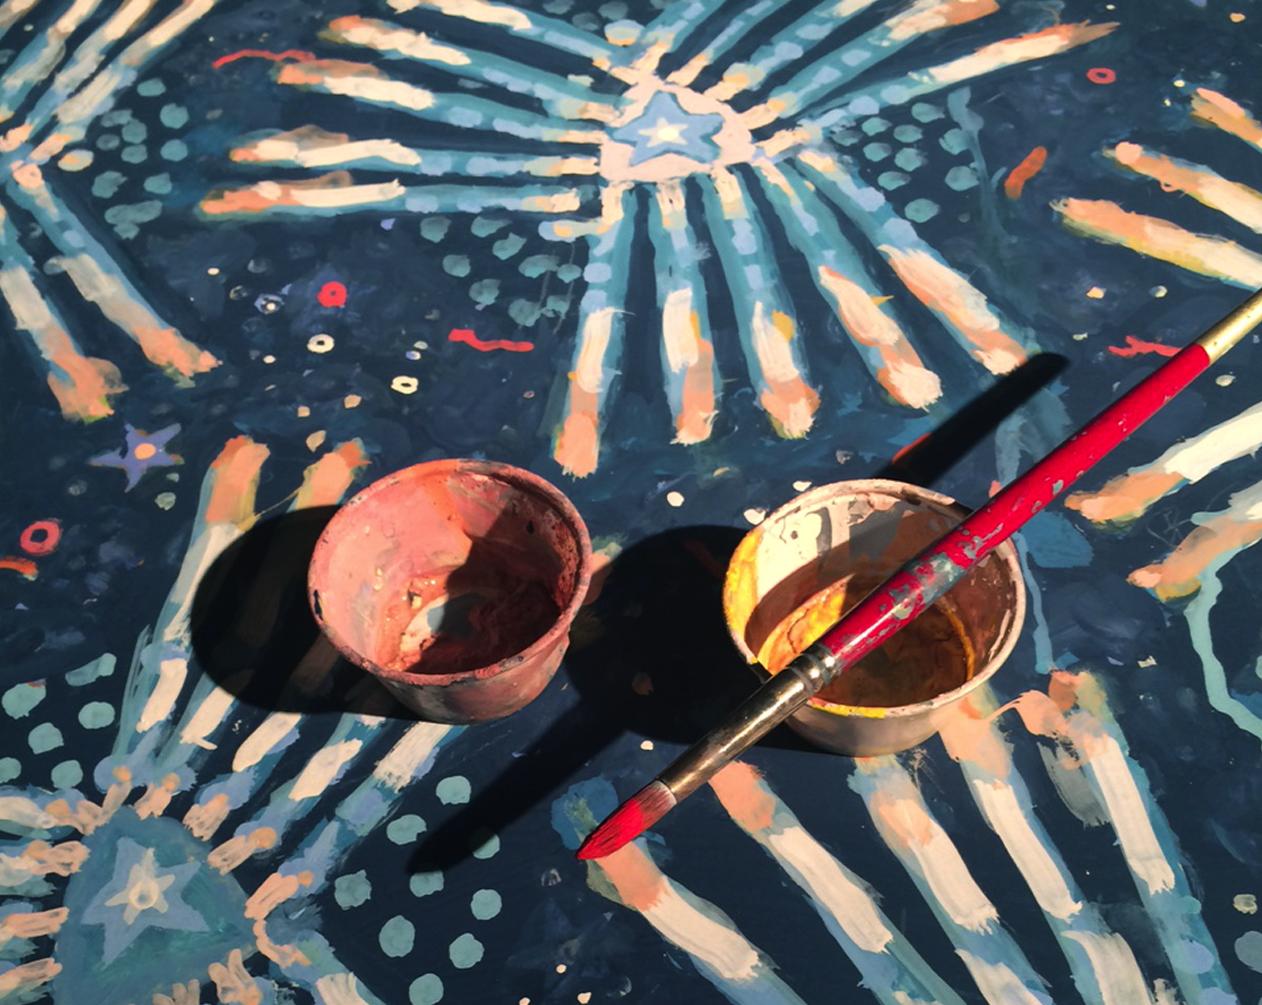 Zak_4x4_studio_celestial_work_cropped.jpg